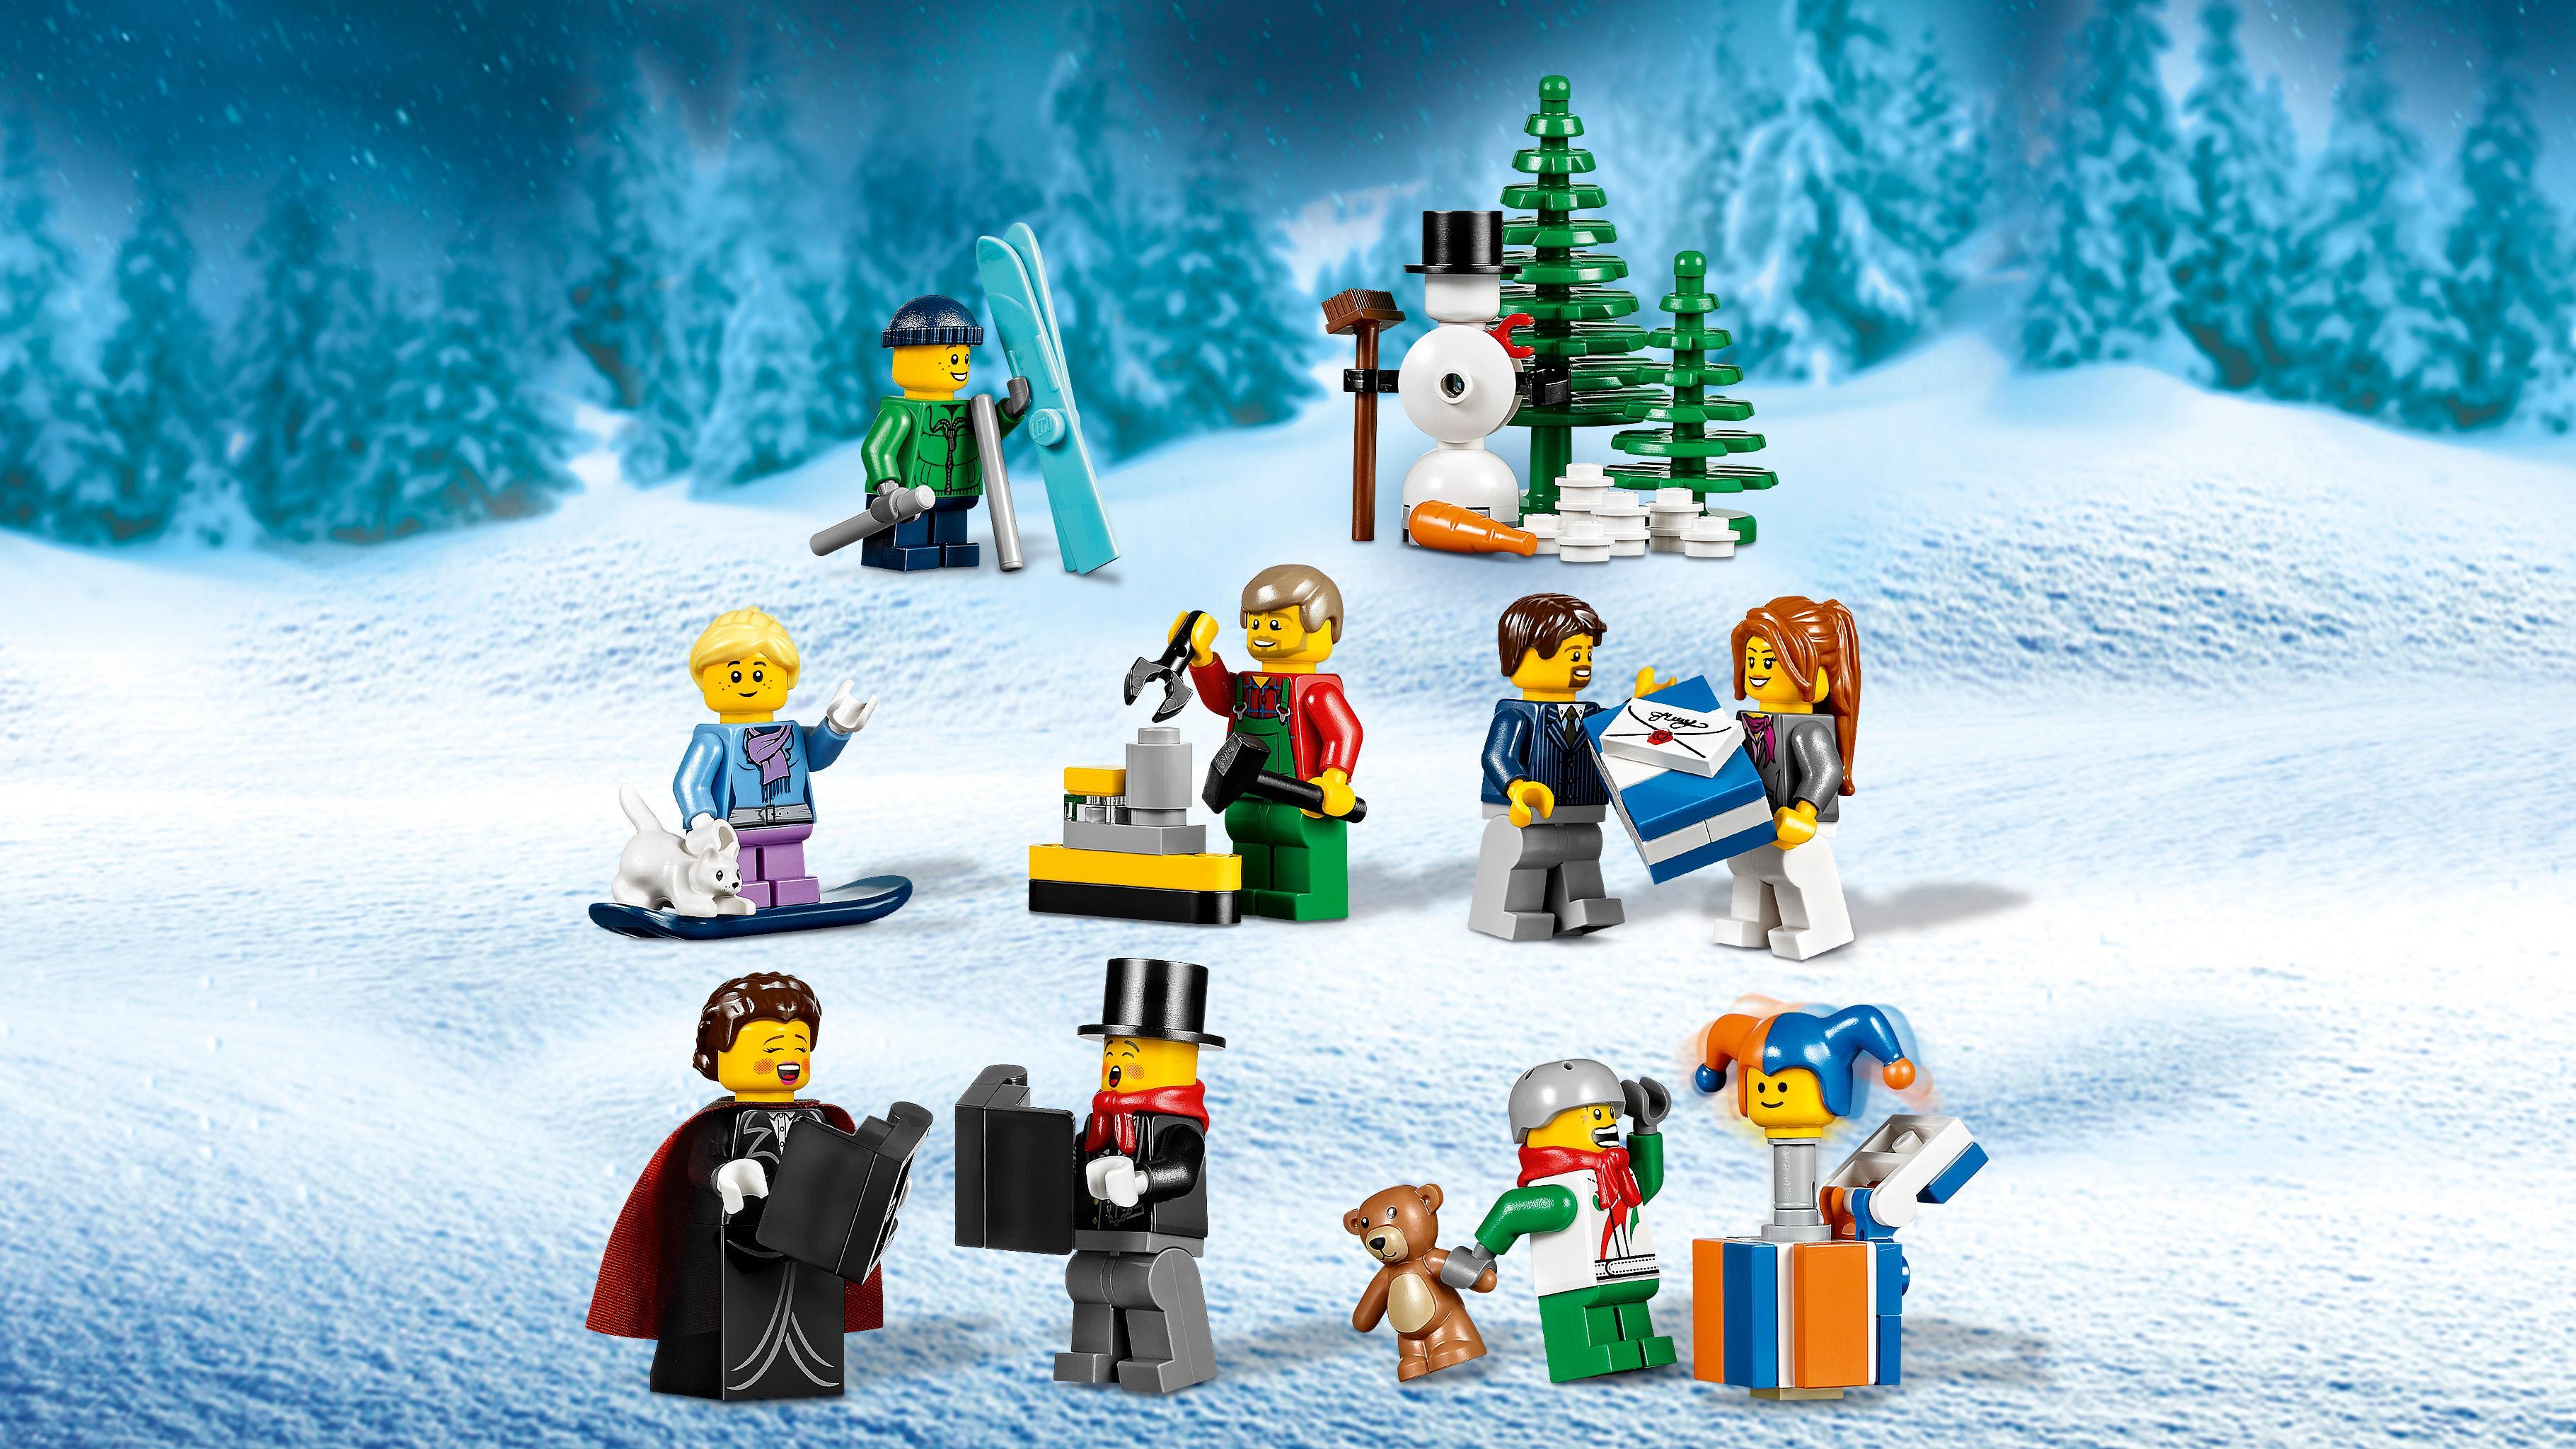 lego creator expert winter toy shop toys games. Black Bedroom Furniture Sets. Home Design Ideas